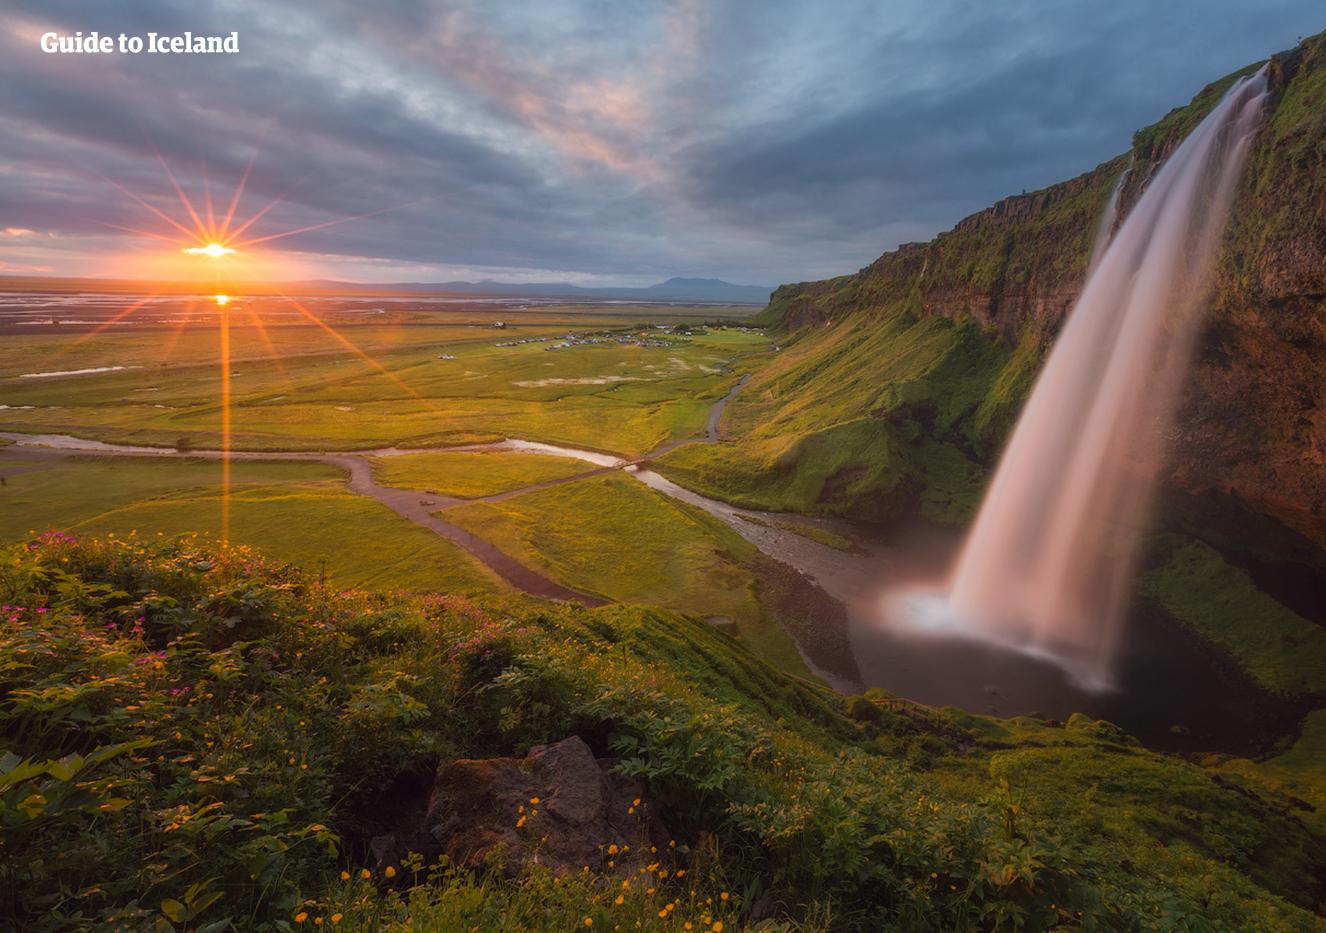 Piękny wodospad Seljalandsfoss  spada nad wklęsłą ścianą klifu.